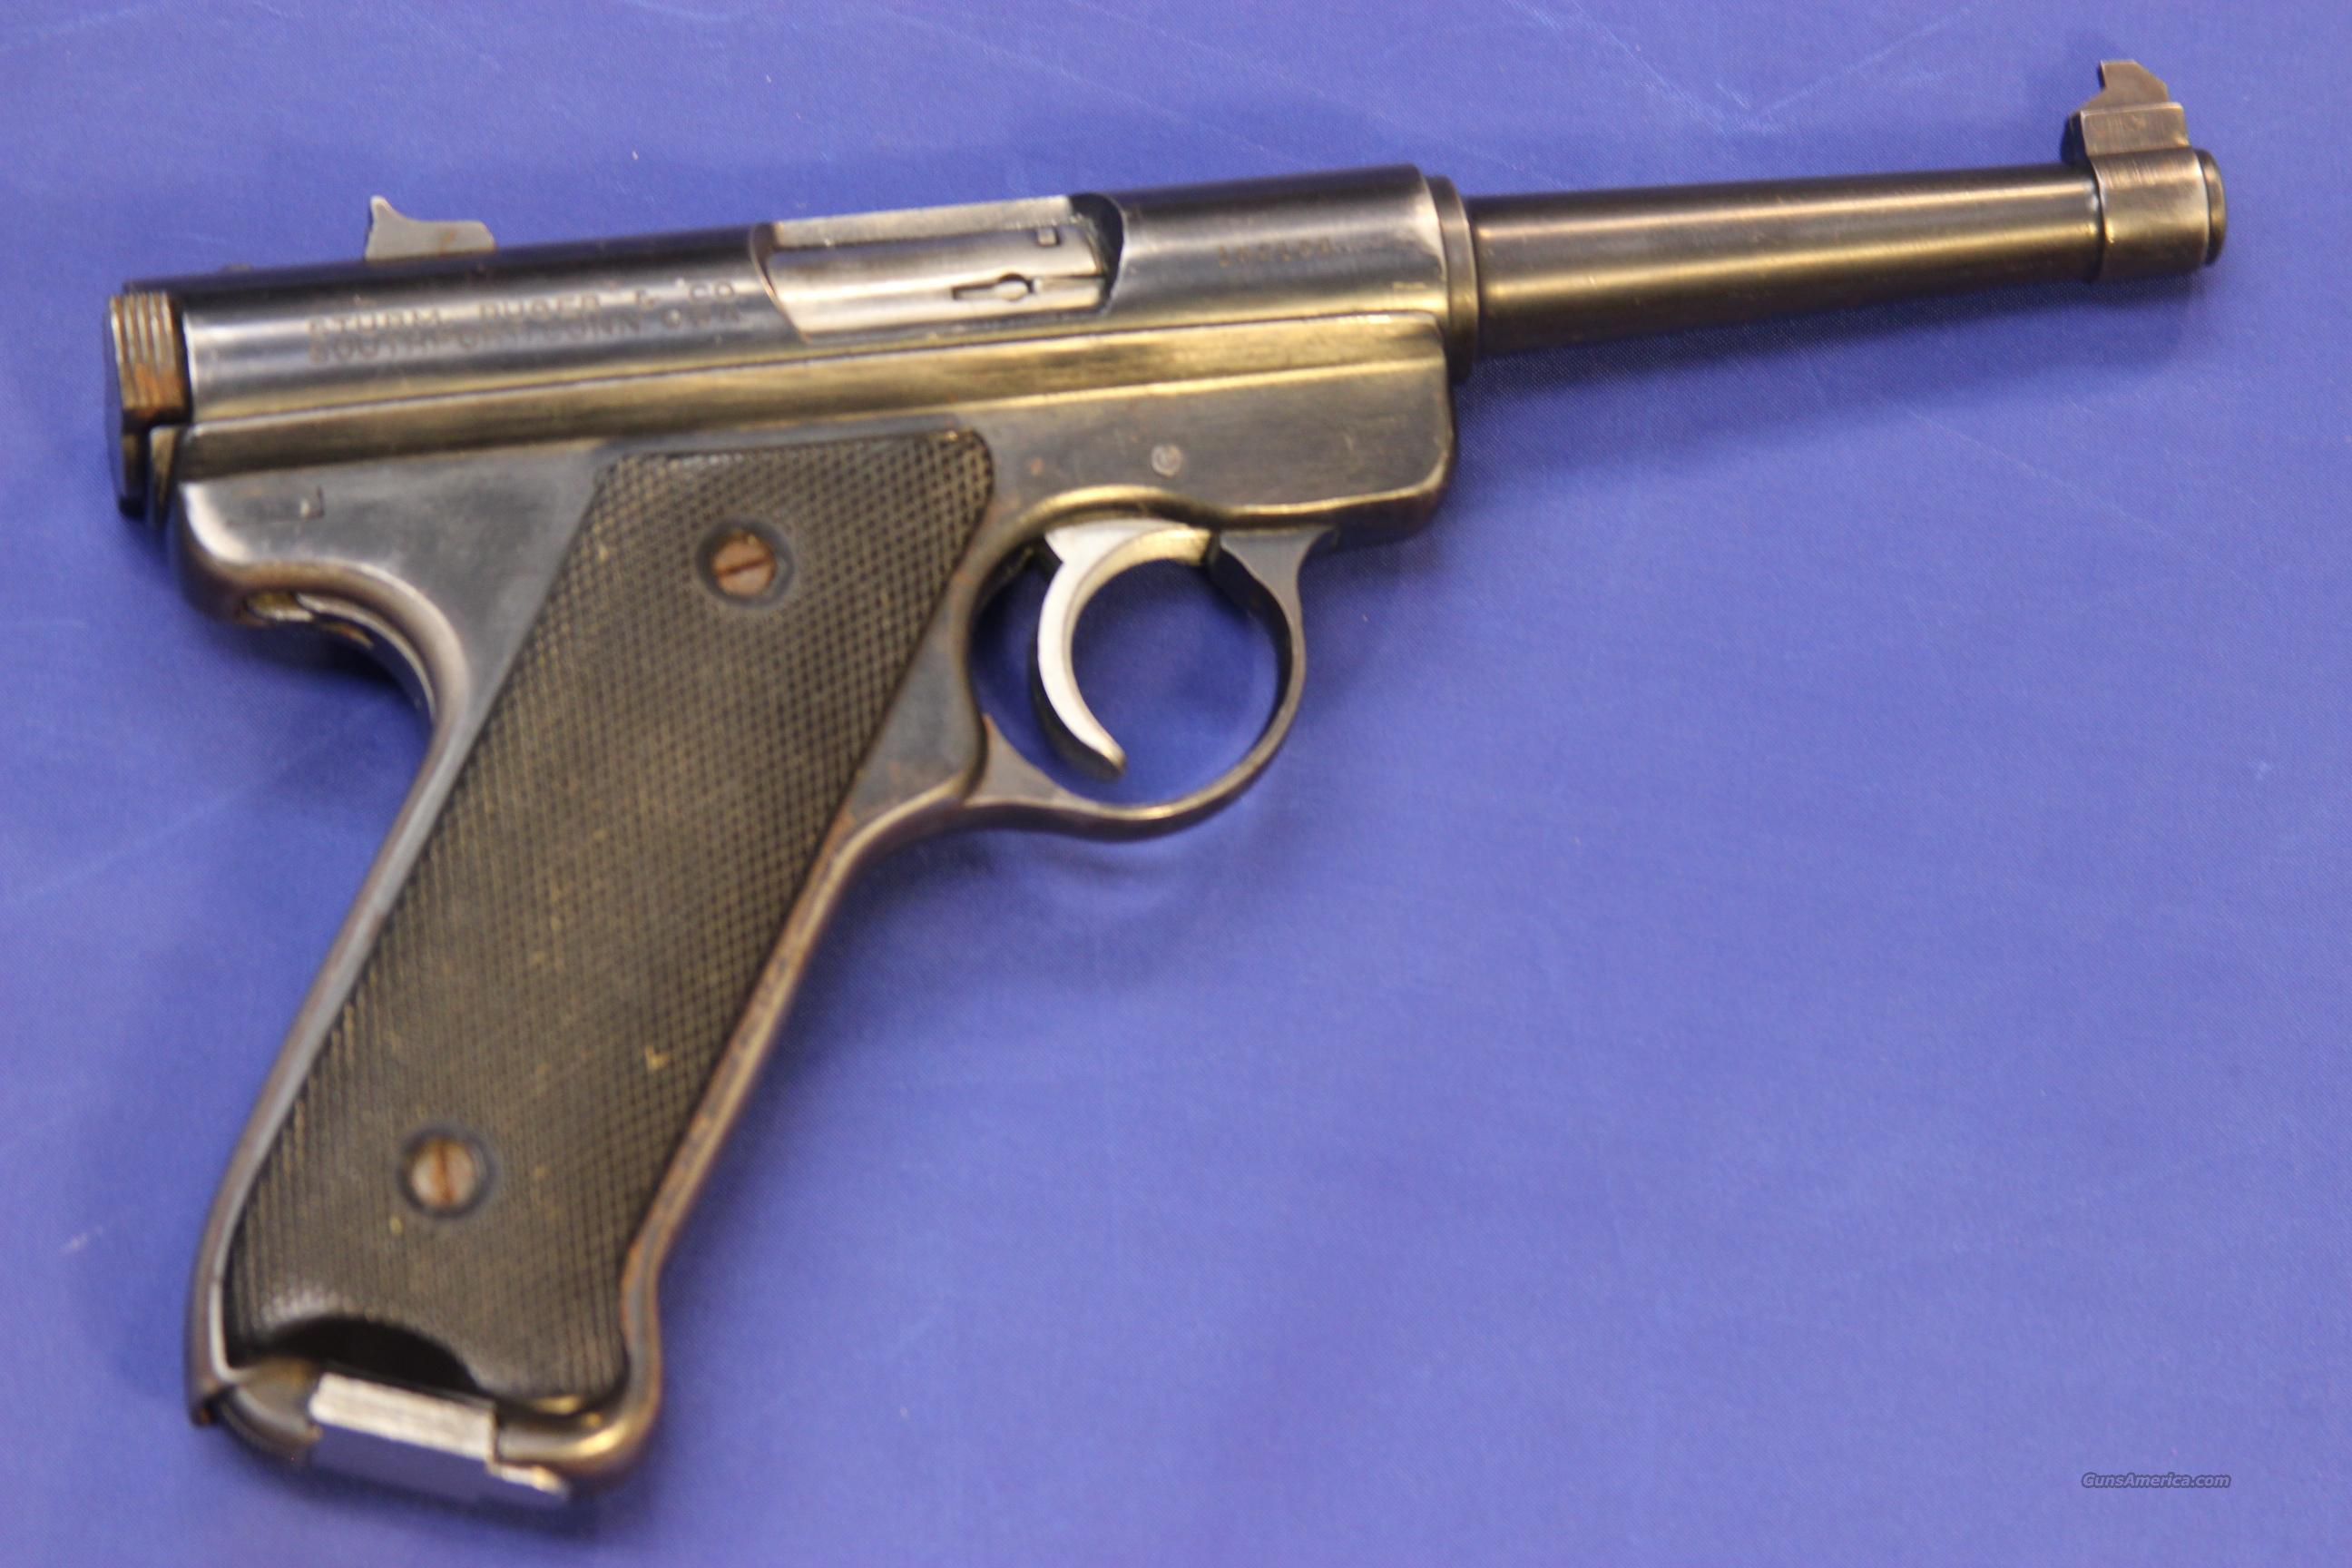 Ruger Mark I 22 caliber pistol. | The Firearms Forum